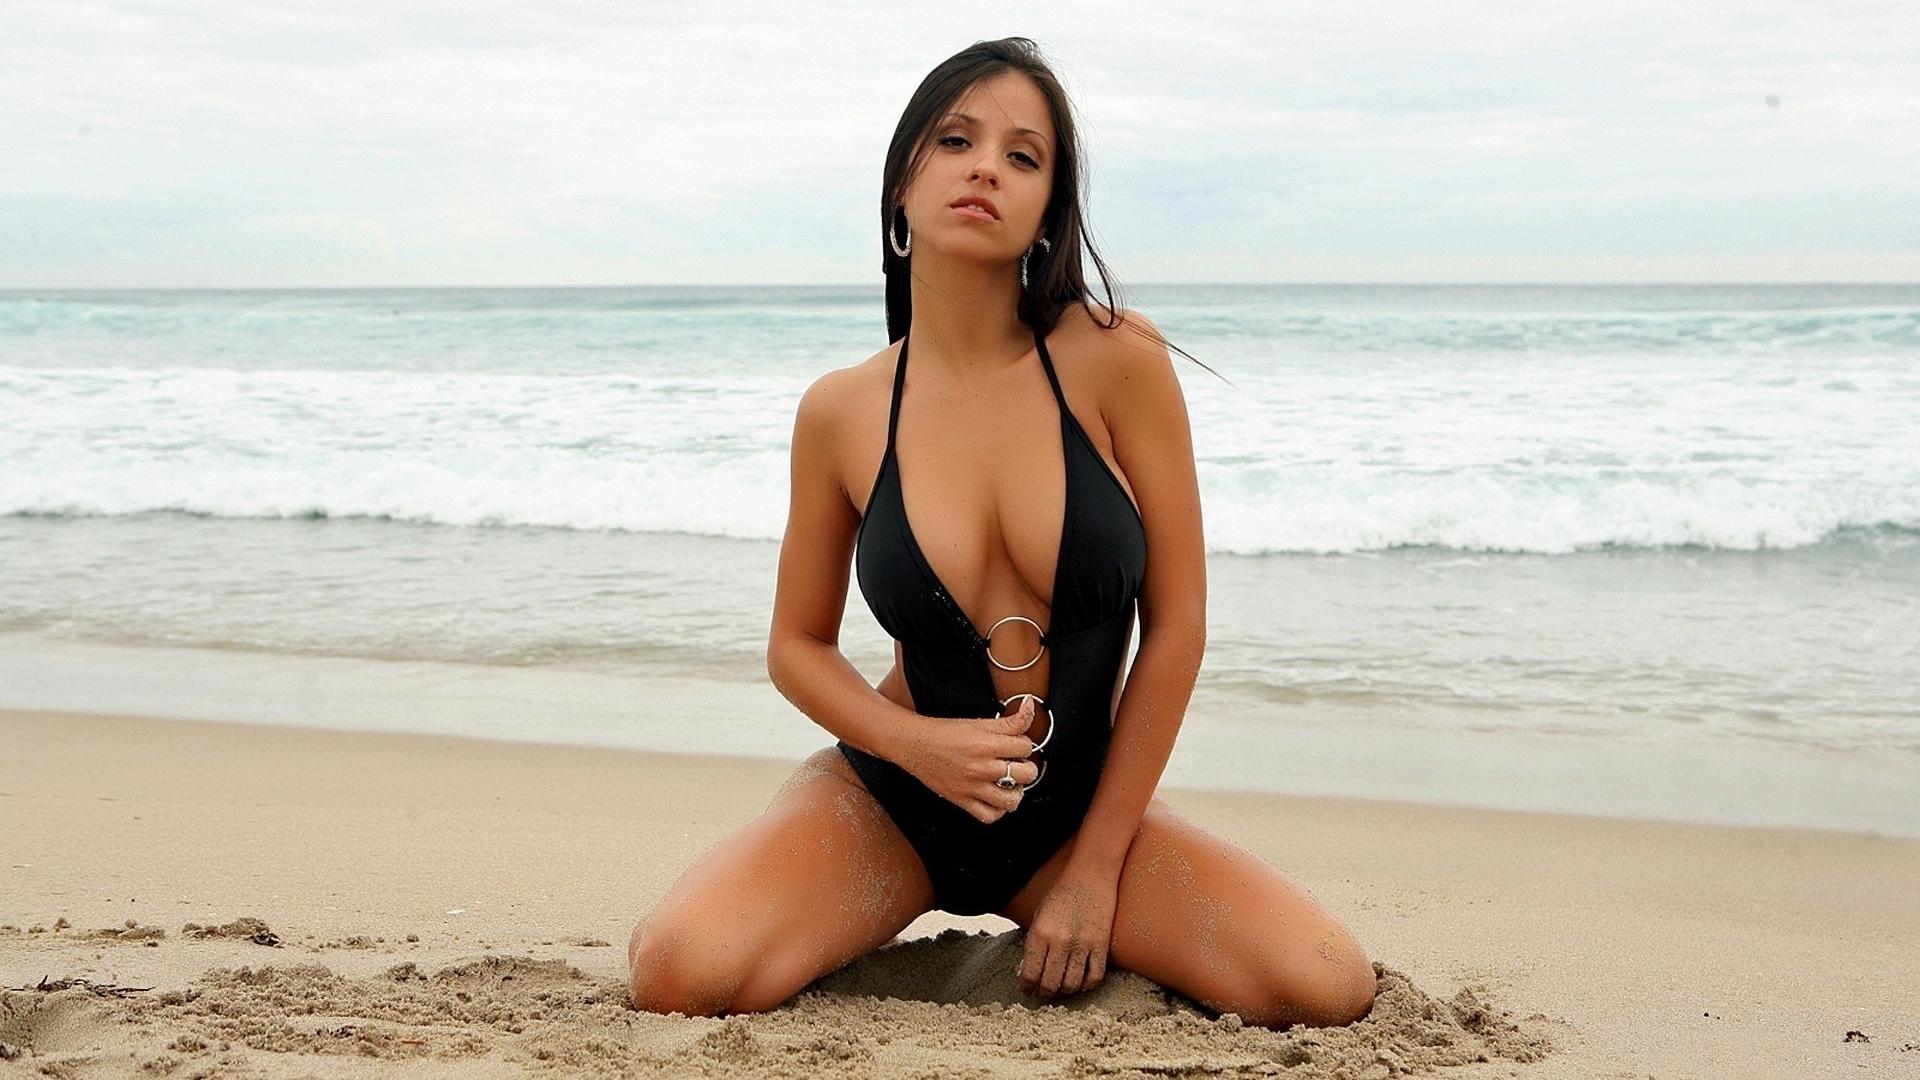 Картинки девушки на пляже на рабочий стол, днем